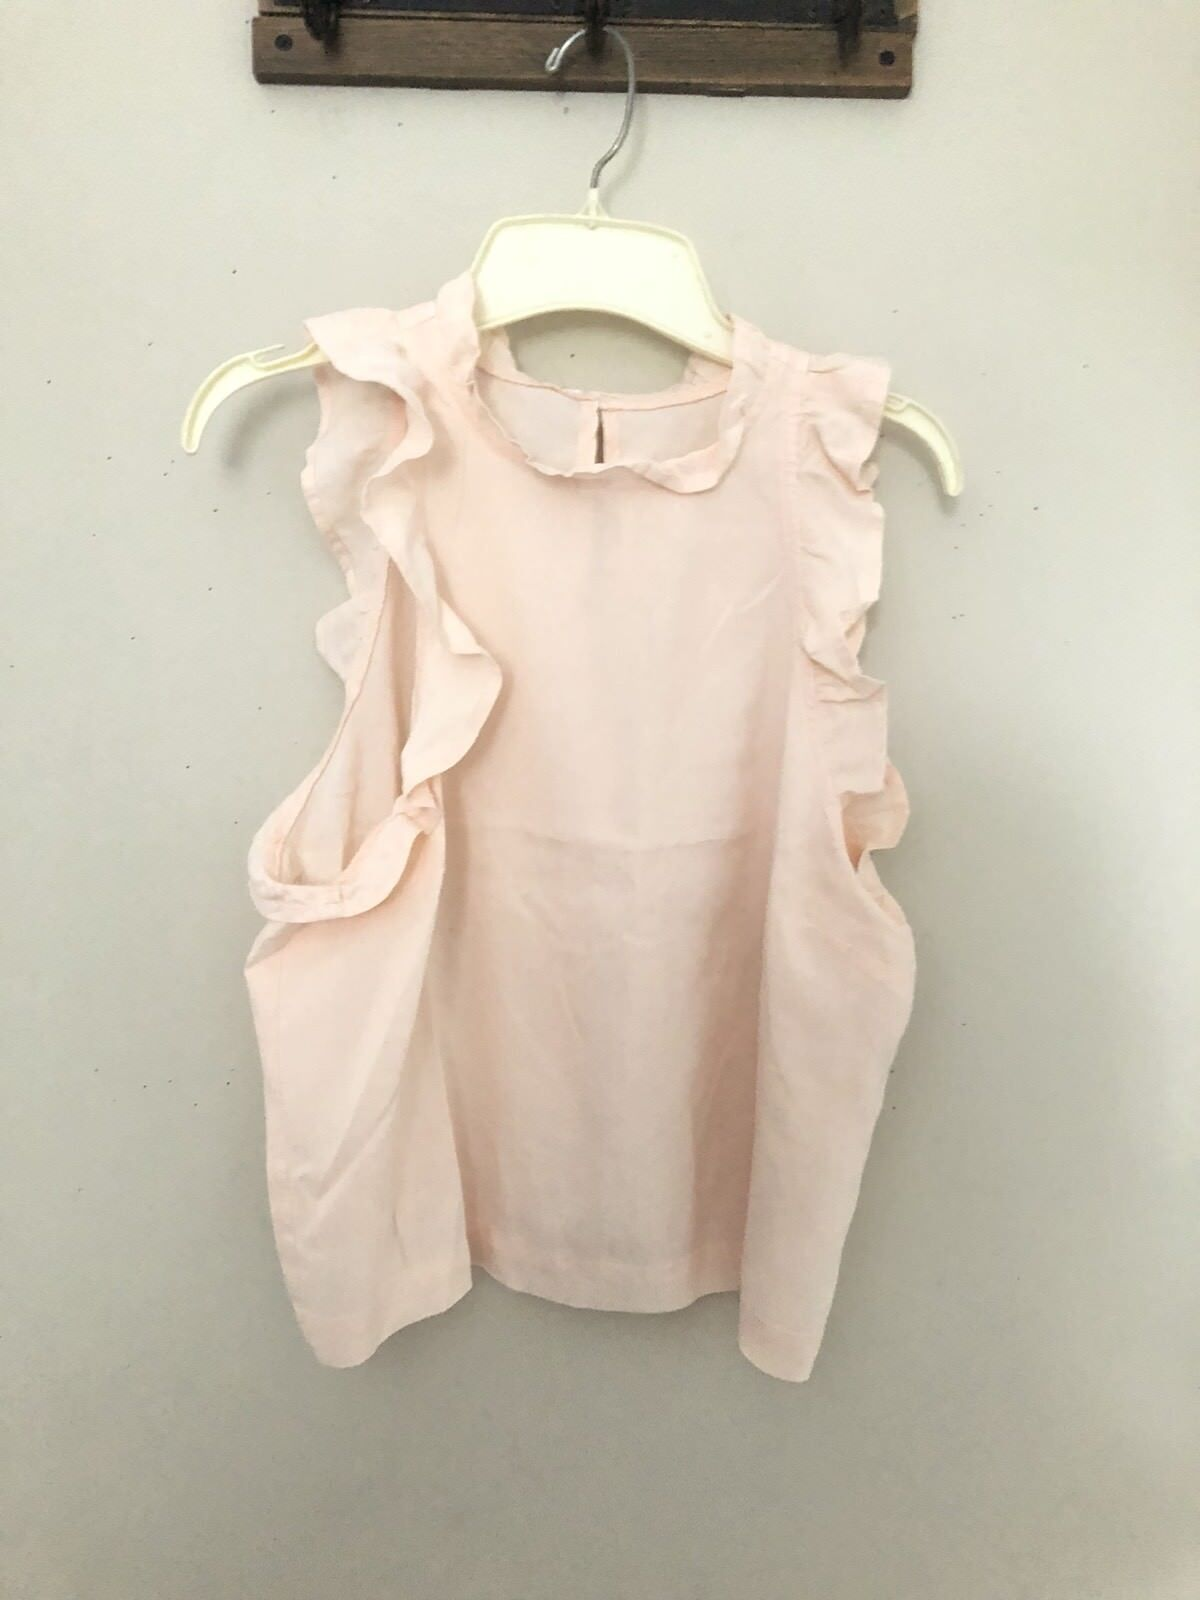 NEW CLOTH & STONE BELLA DAHL Sz XS RUFFLE TANK TOP SLEEVELESS SHIRT IN PEACH